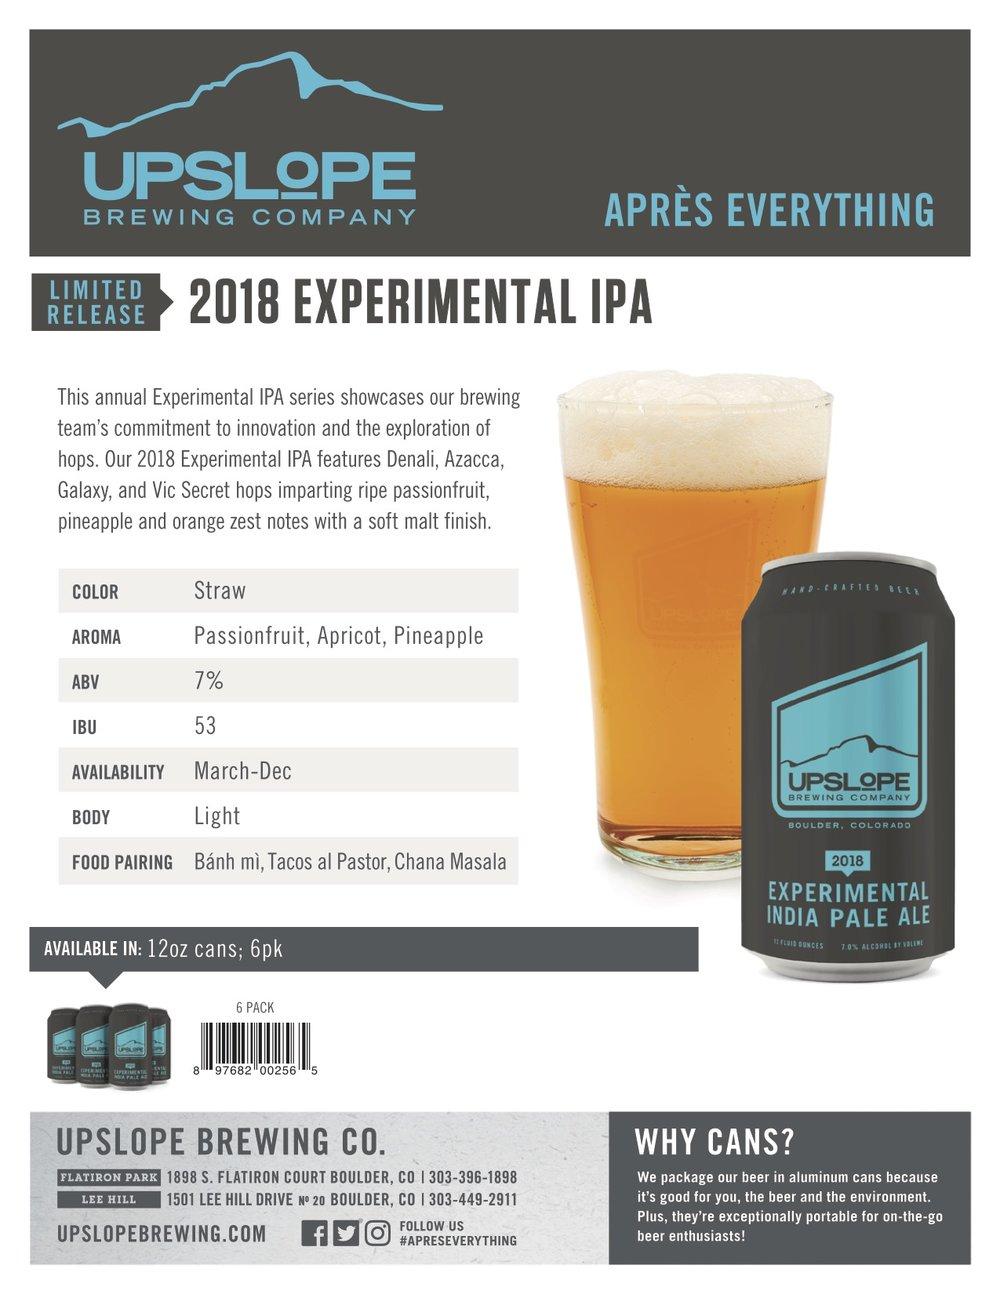 USLPB-0819 Experimental IPA 2018 - Sales Sheet-Web.jpg